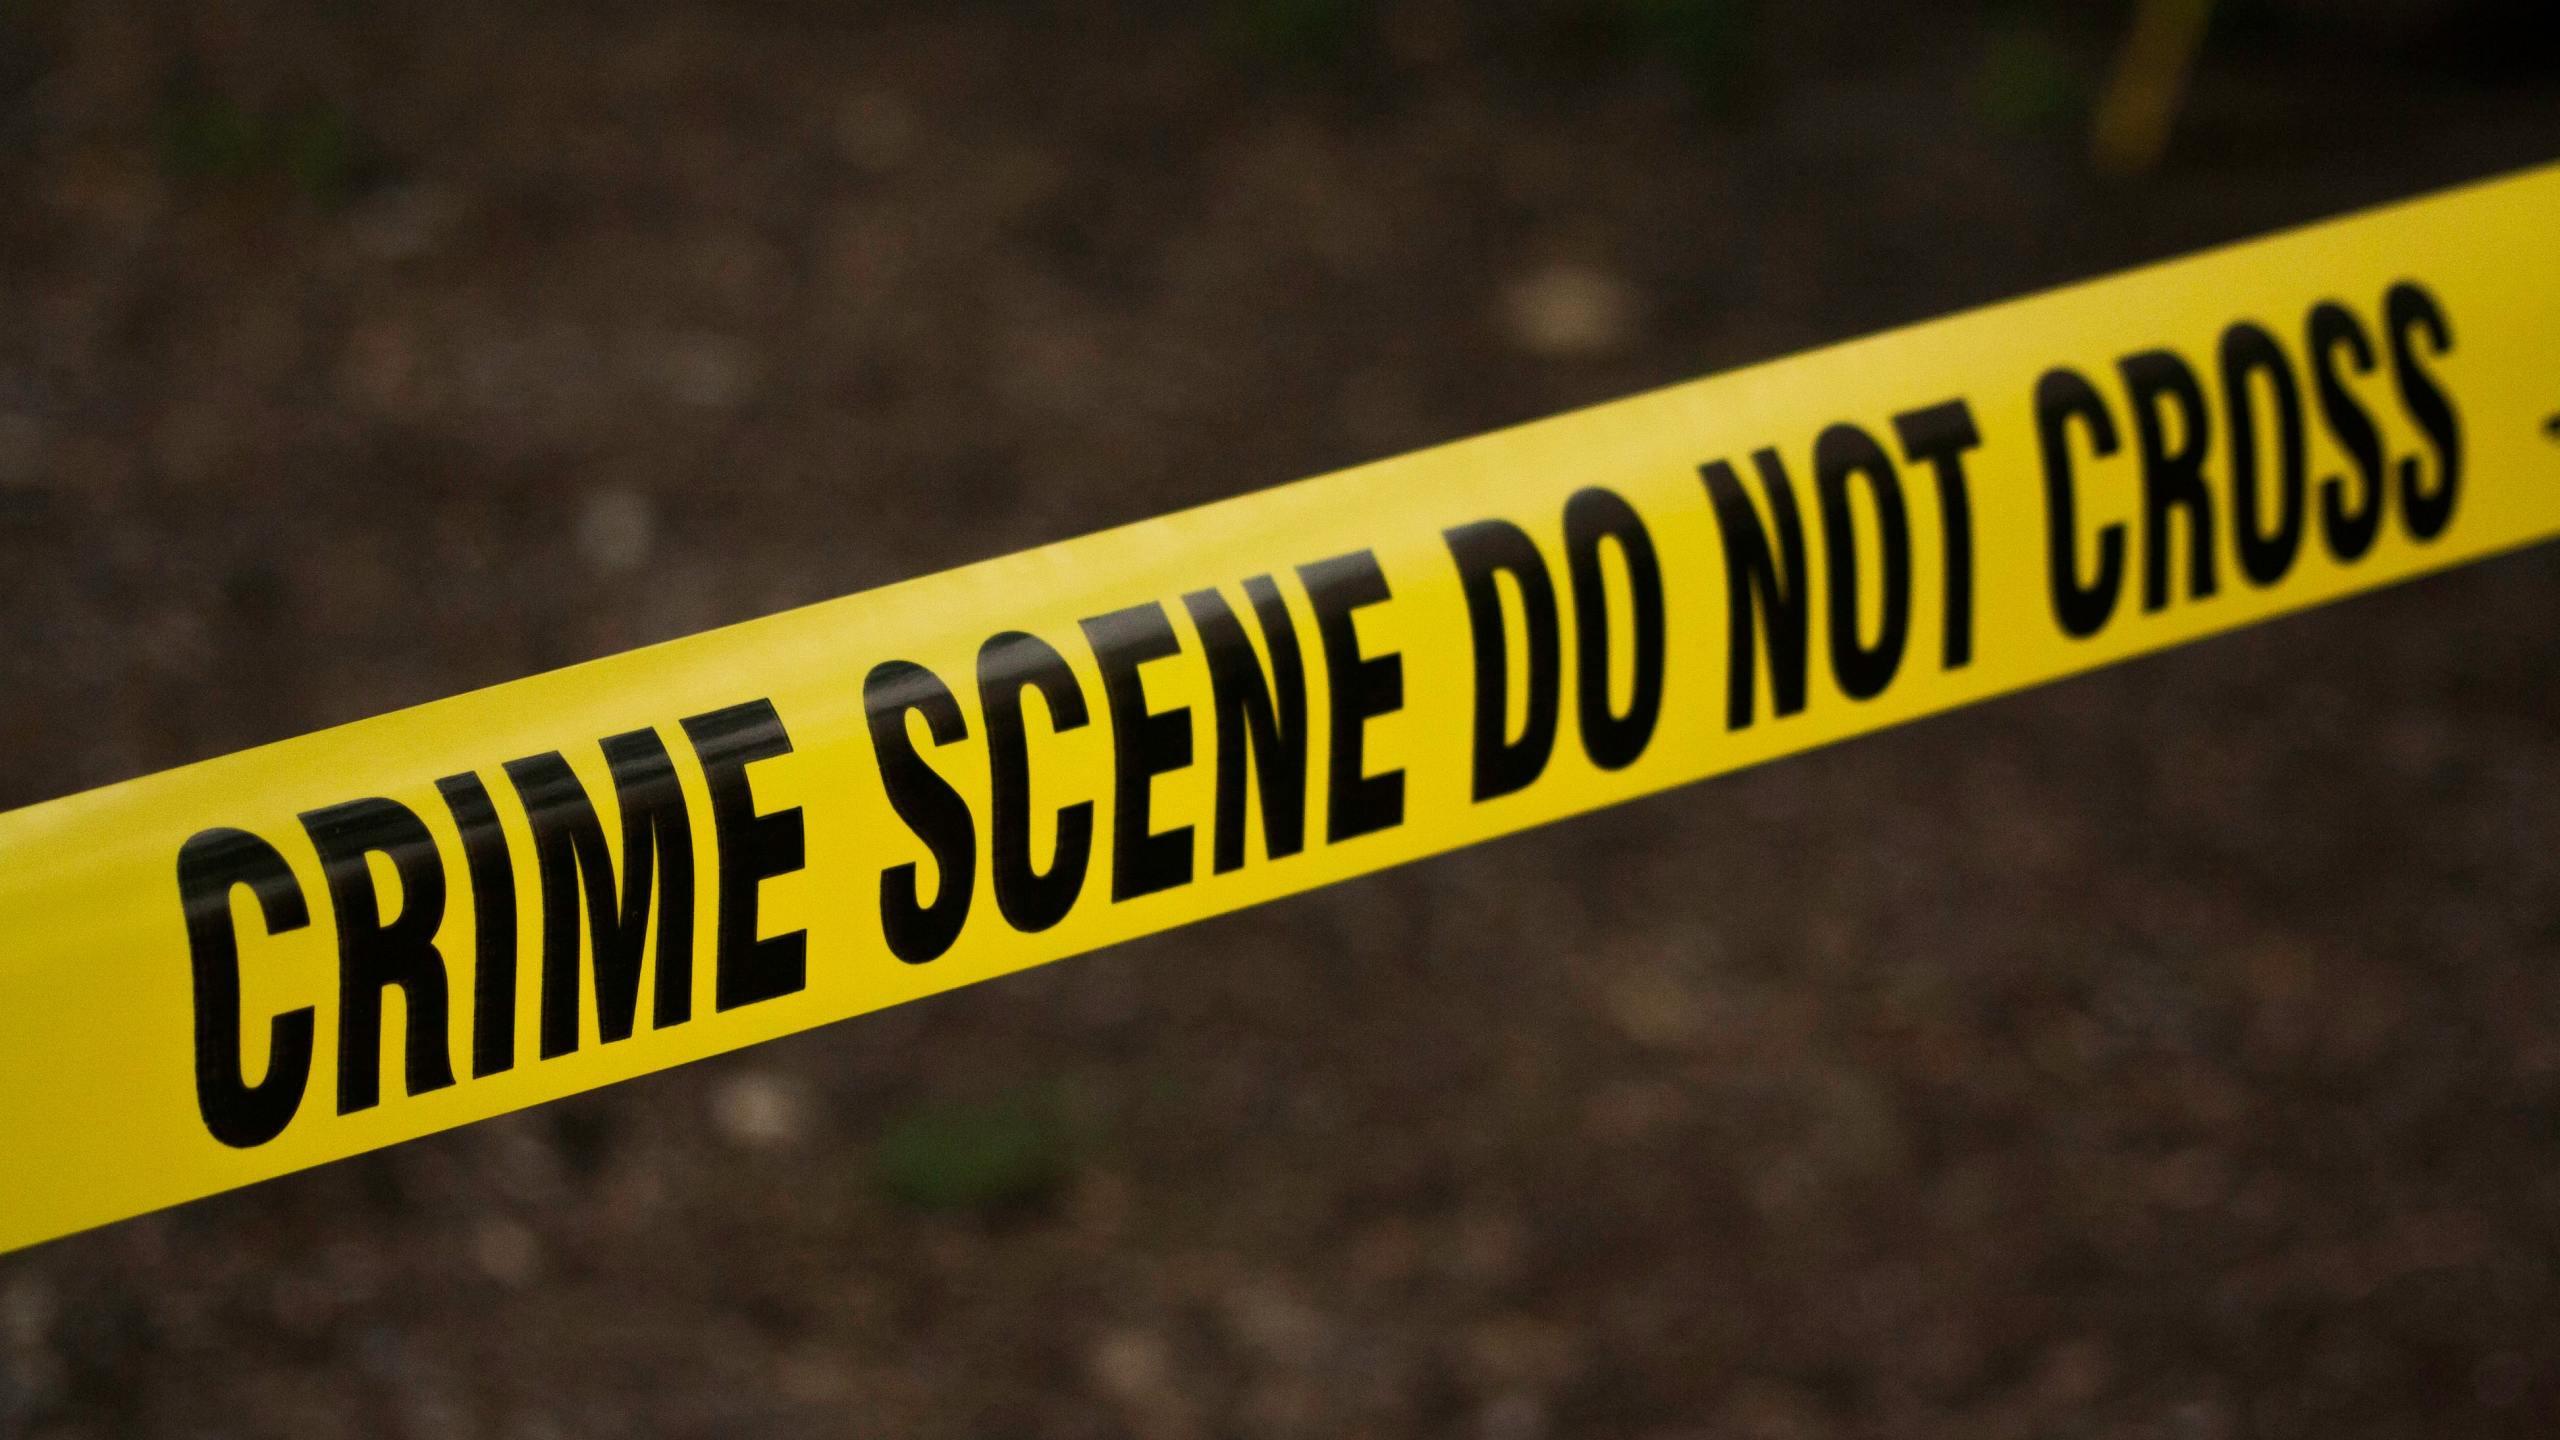 Police line, crime scene line